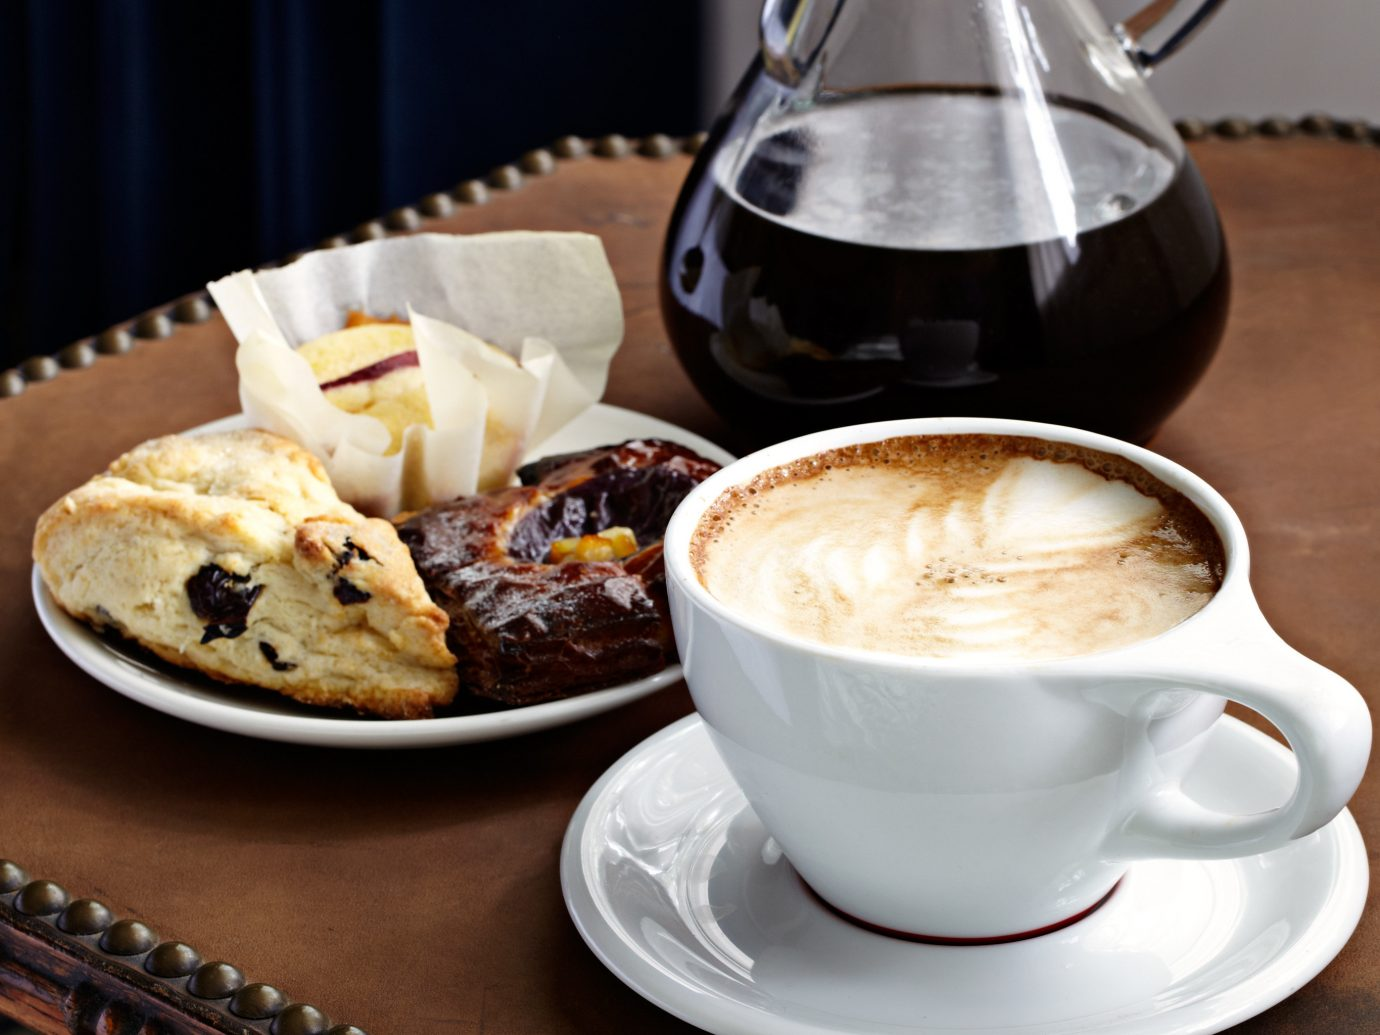 Boutique City Drink Eat Modern plate food cup coffee breakfast dessert flavor